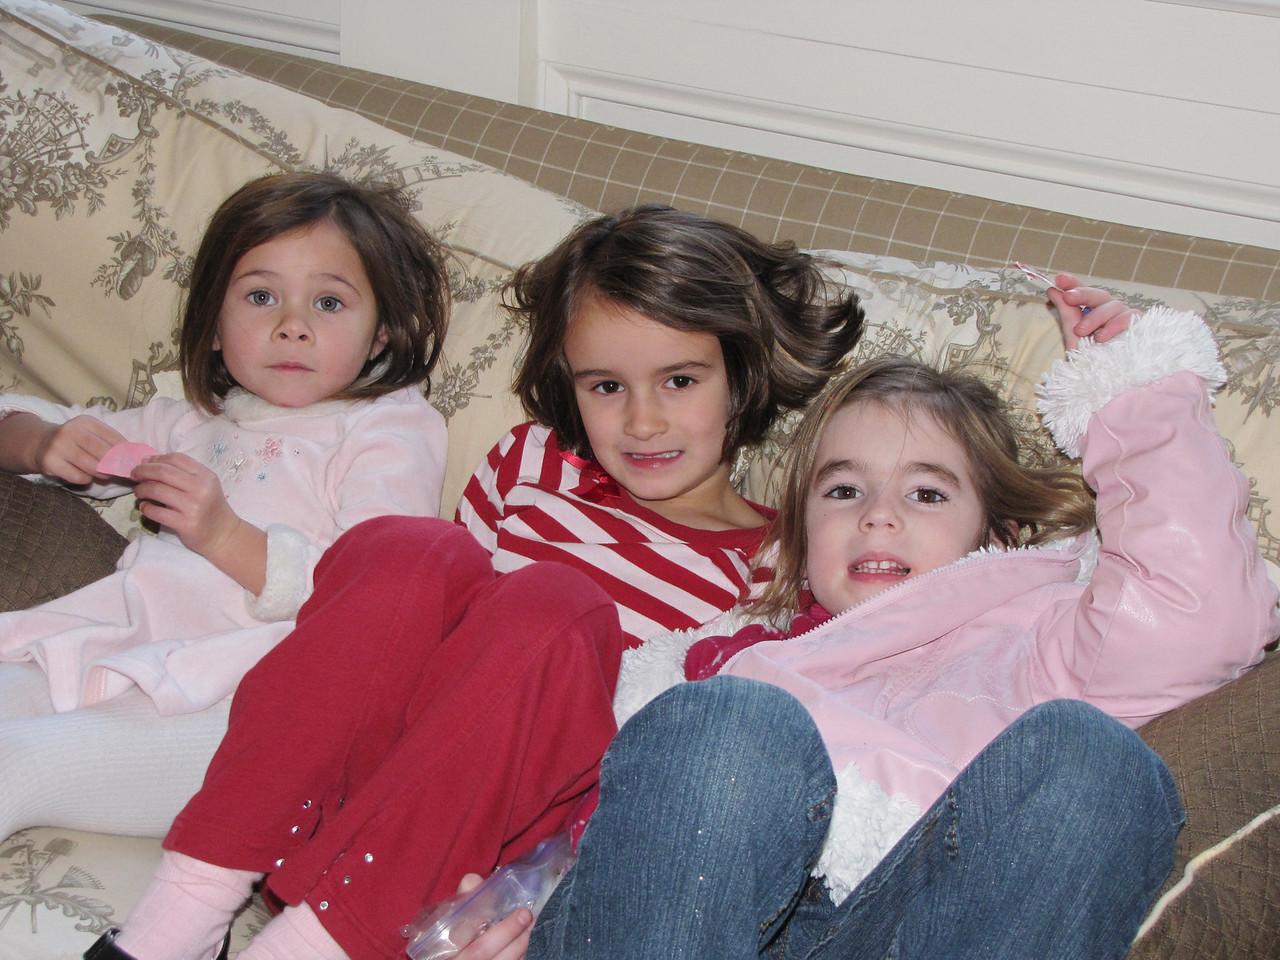 December 23. 2008